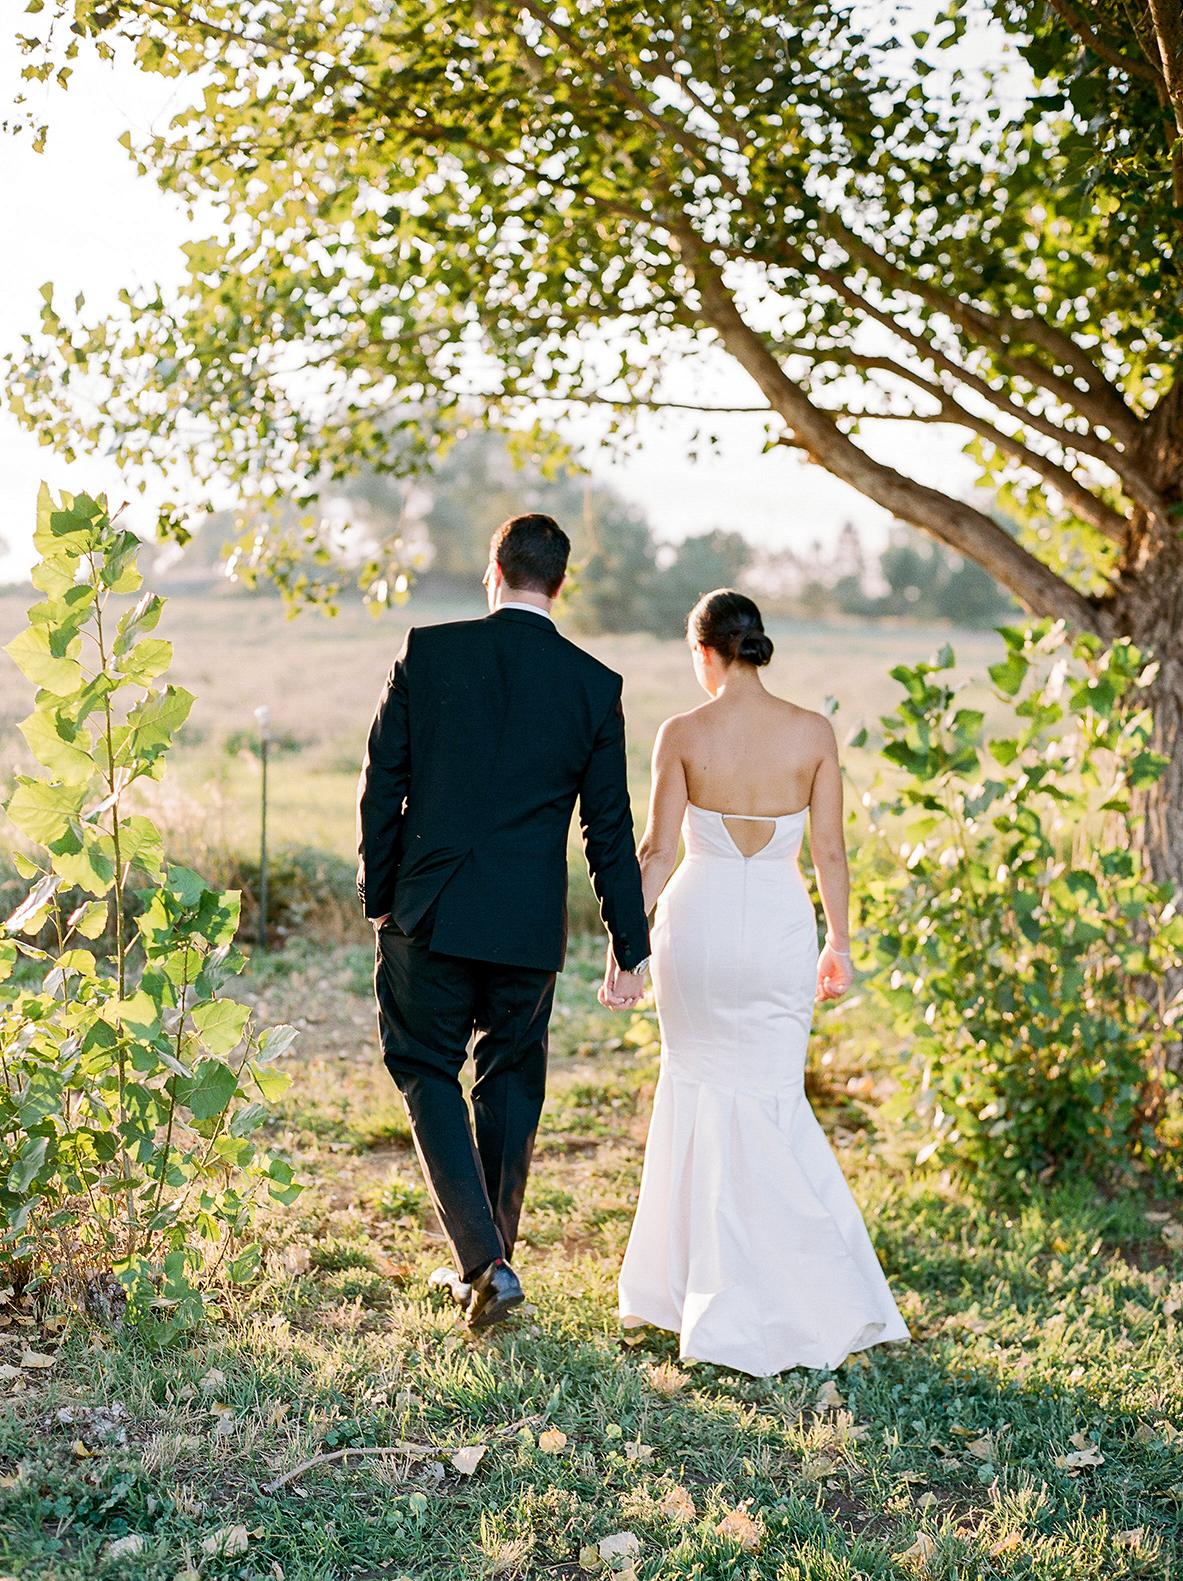 jamie jon wedding couple walking on path